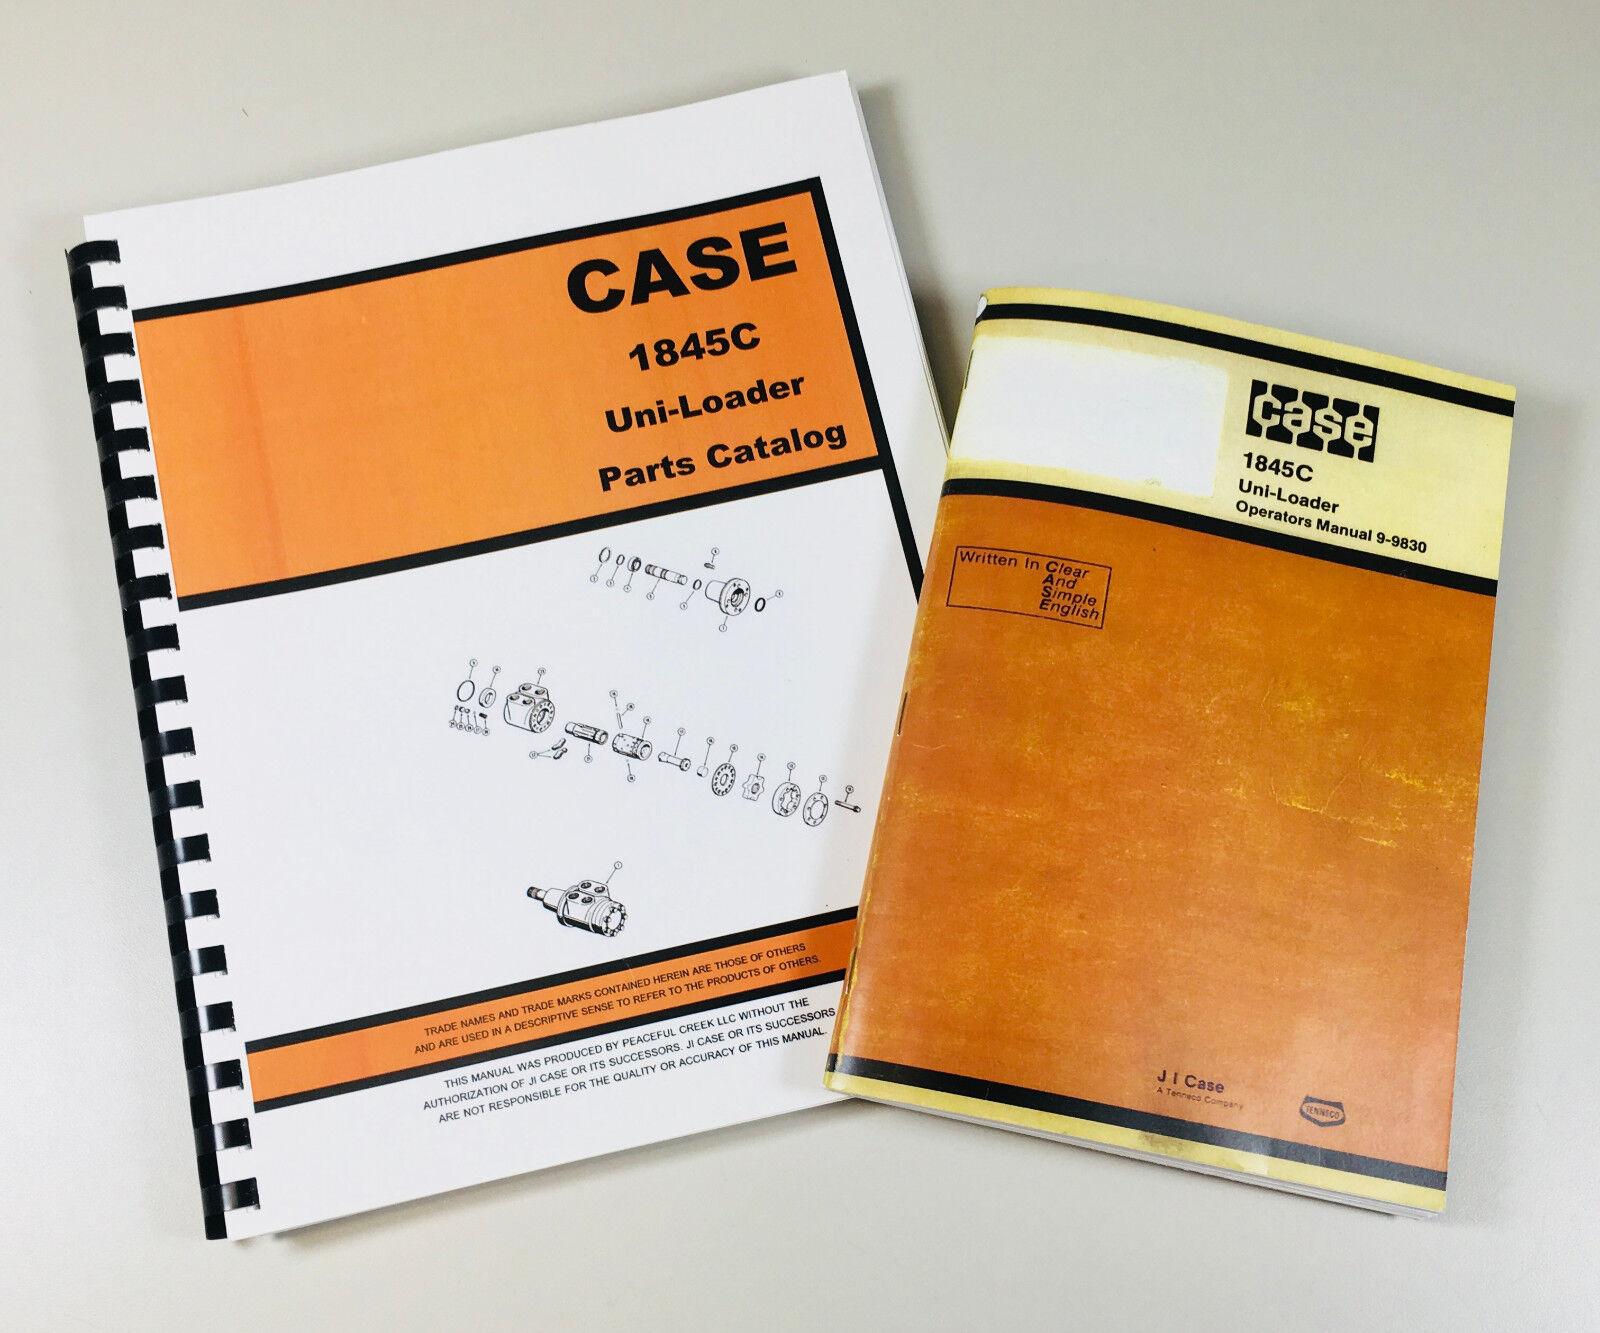 1845C CASE UNI-LOADER. Parts Manual Includes: